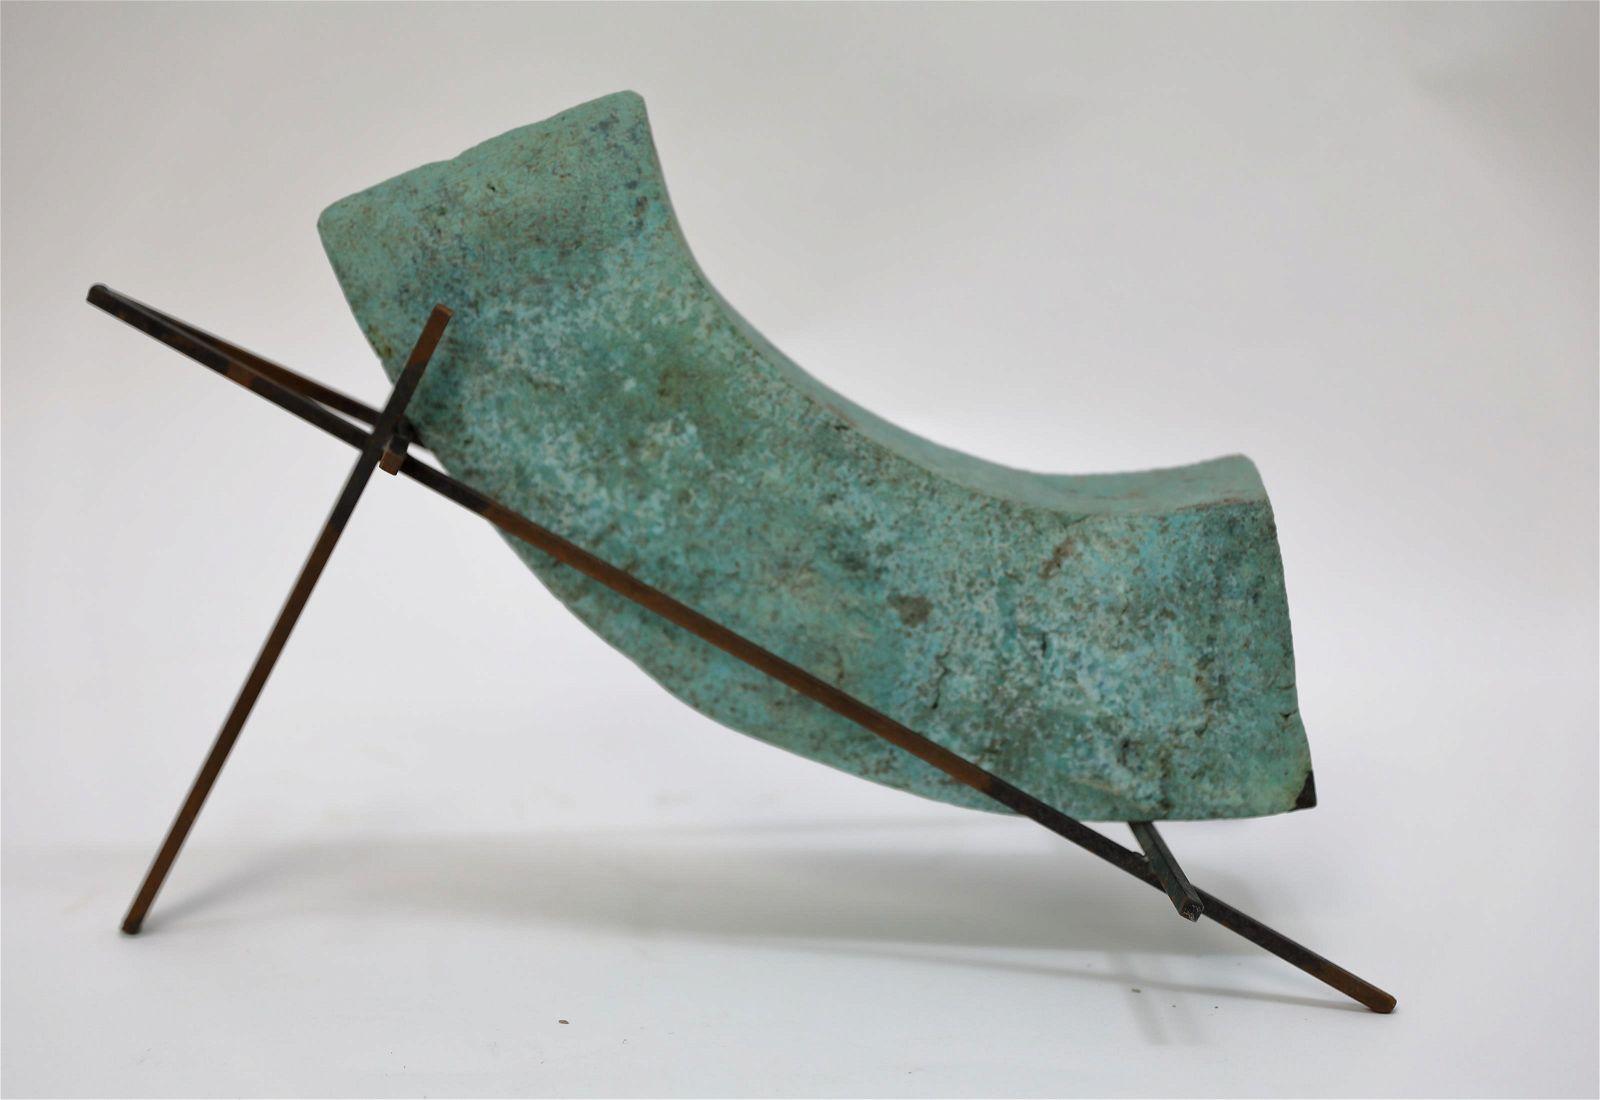 Tony Bloom Ceramic & Metal Modernist Sculpture